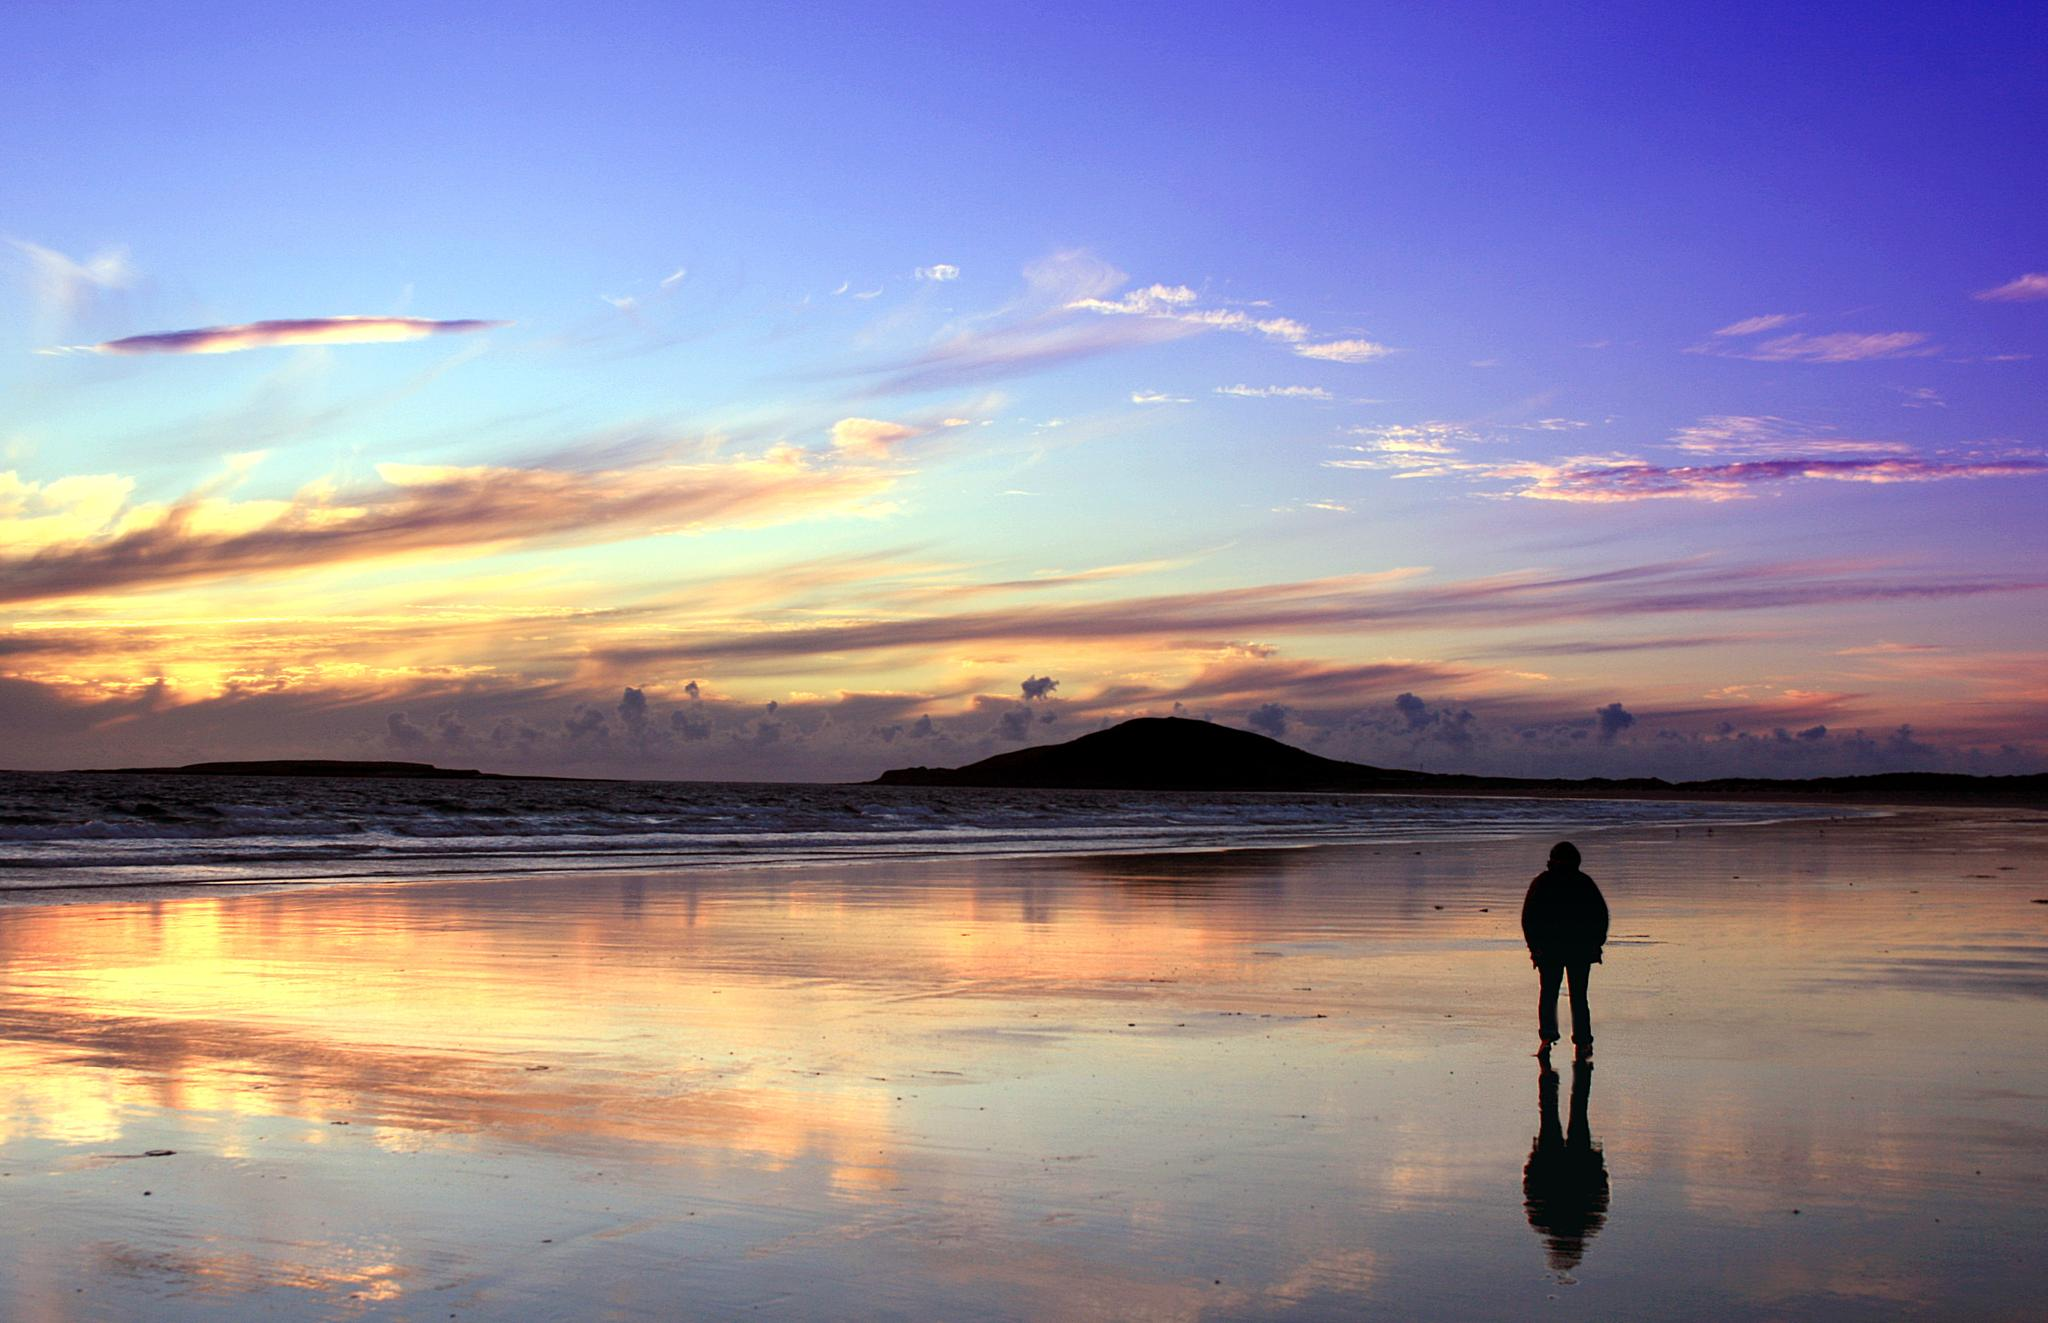 Sligo Sunset by David R Murphy